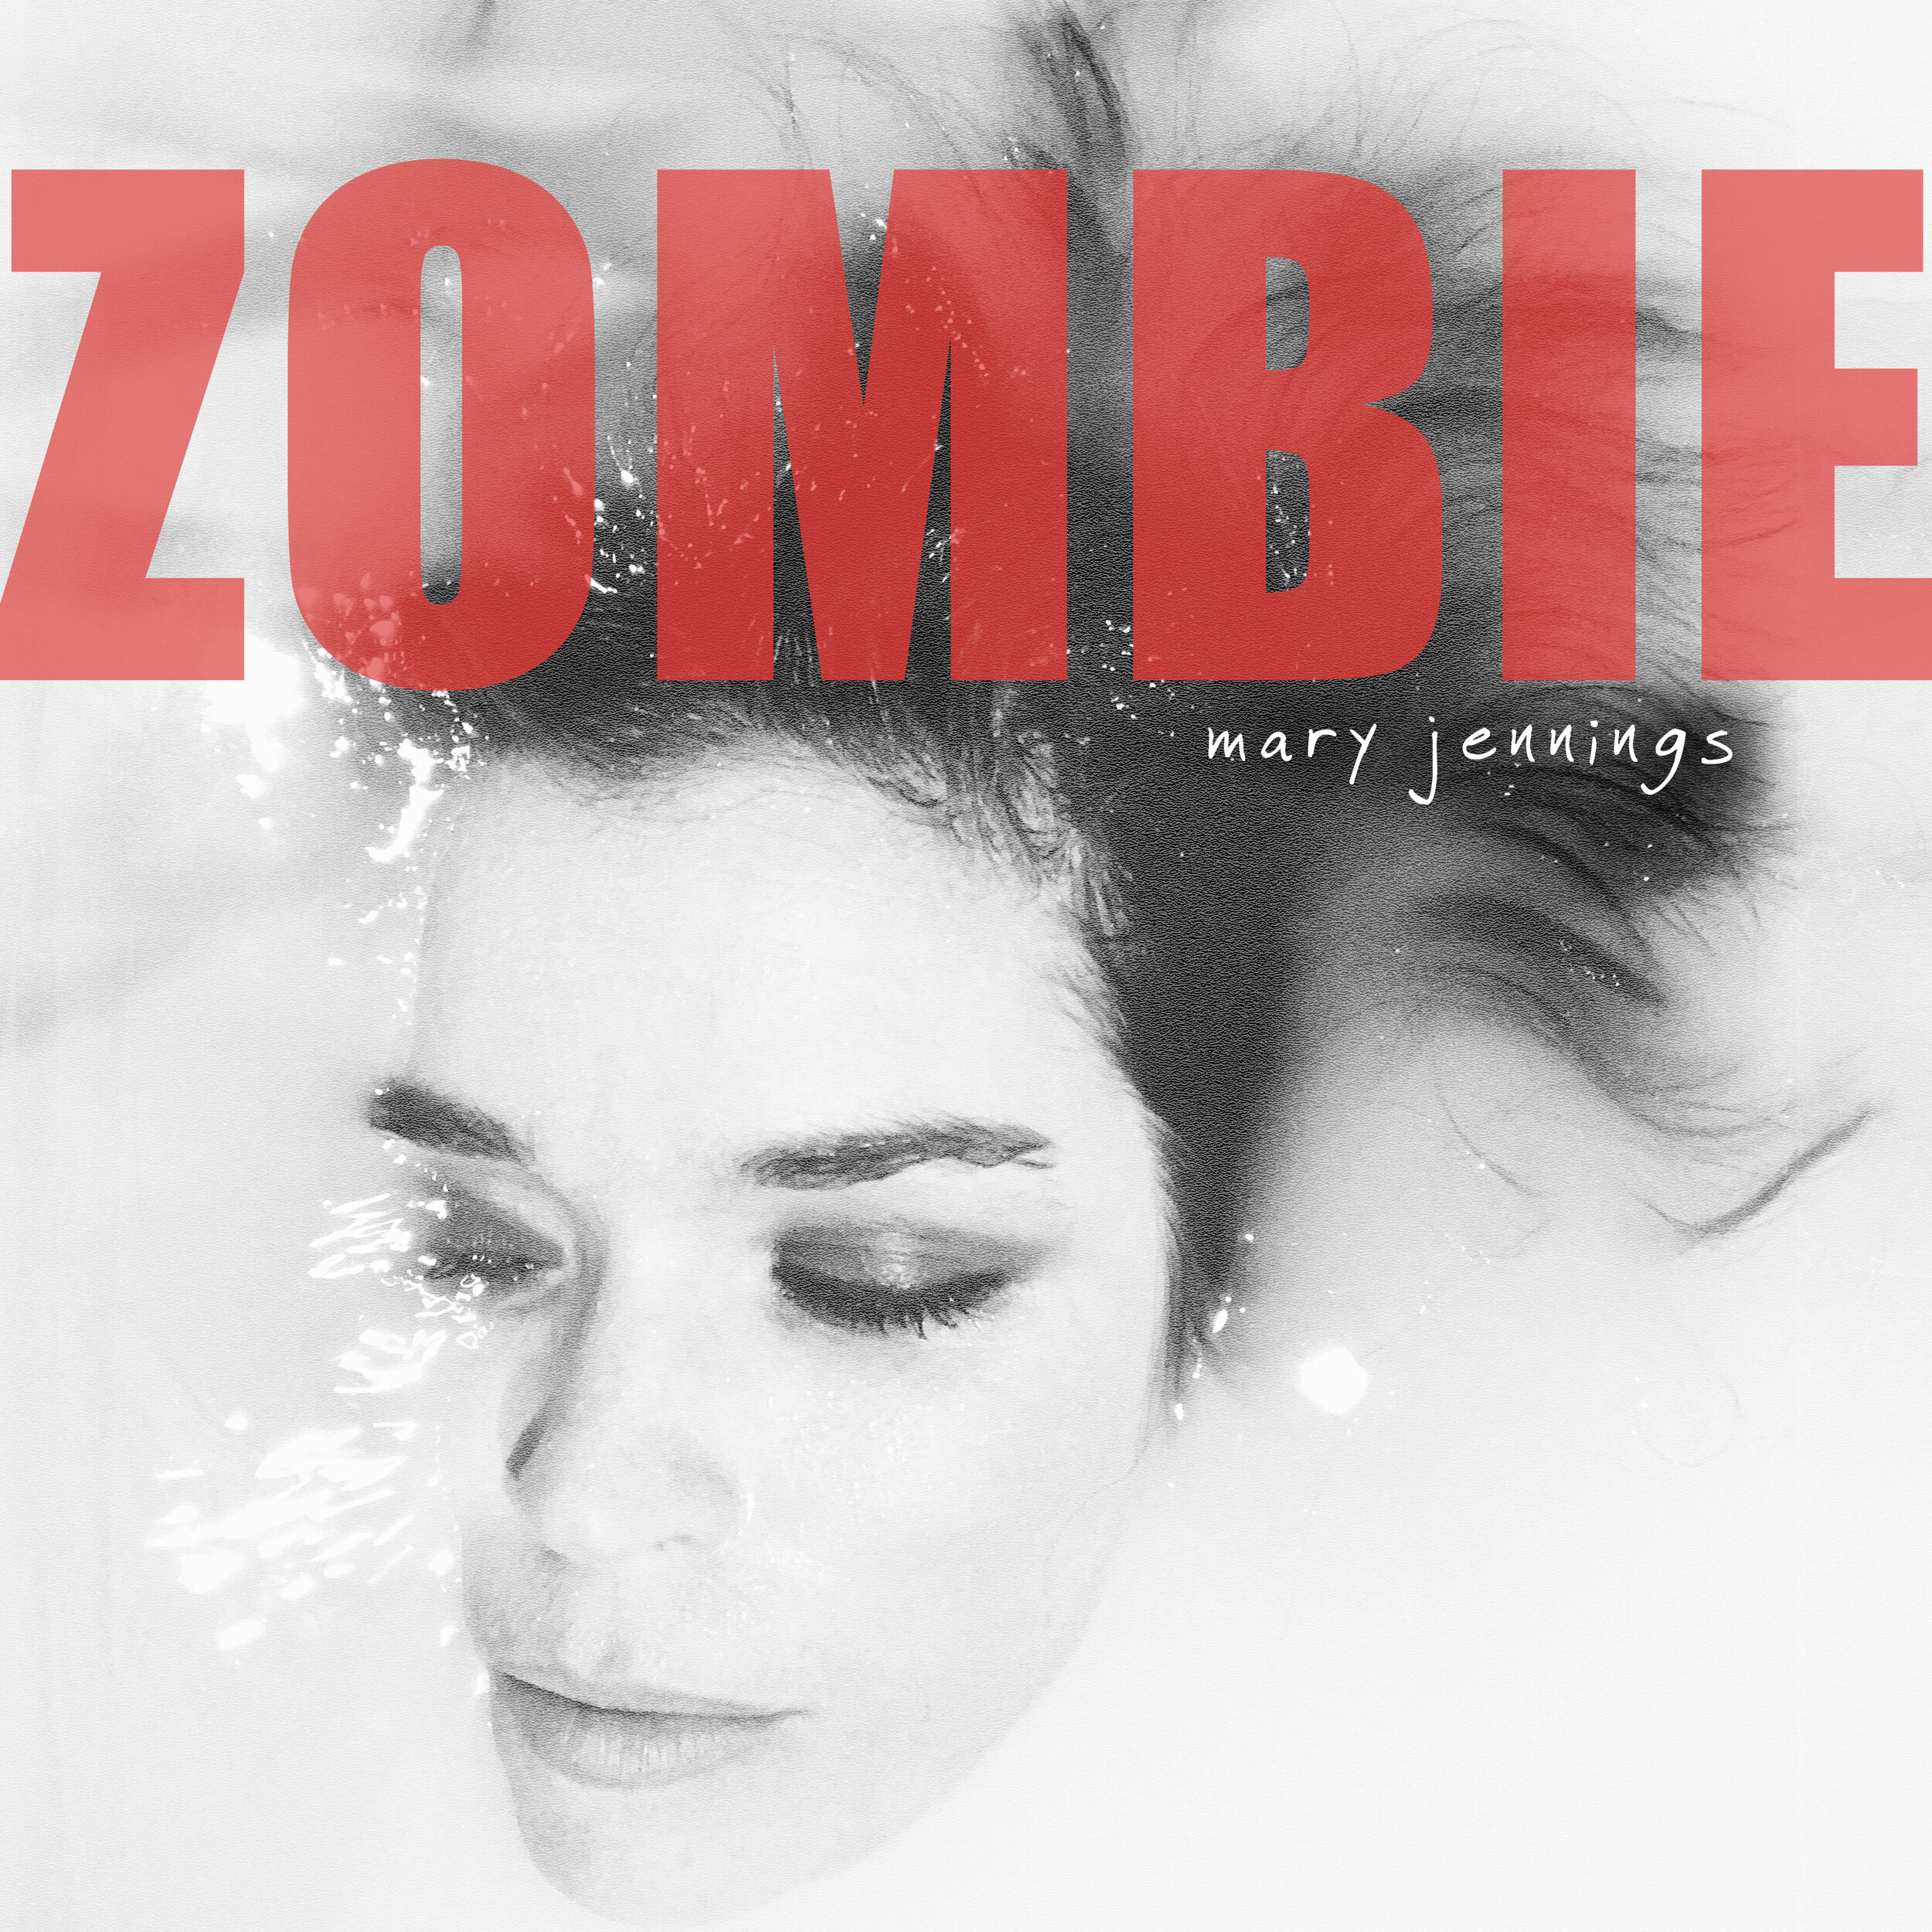 Mary-Jennings-Zombie-FINAL-3000x3000.jpg